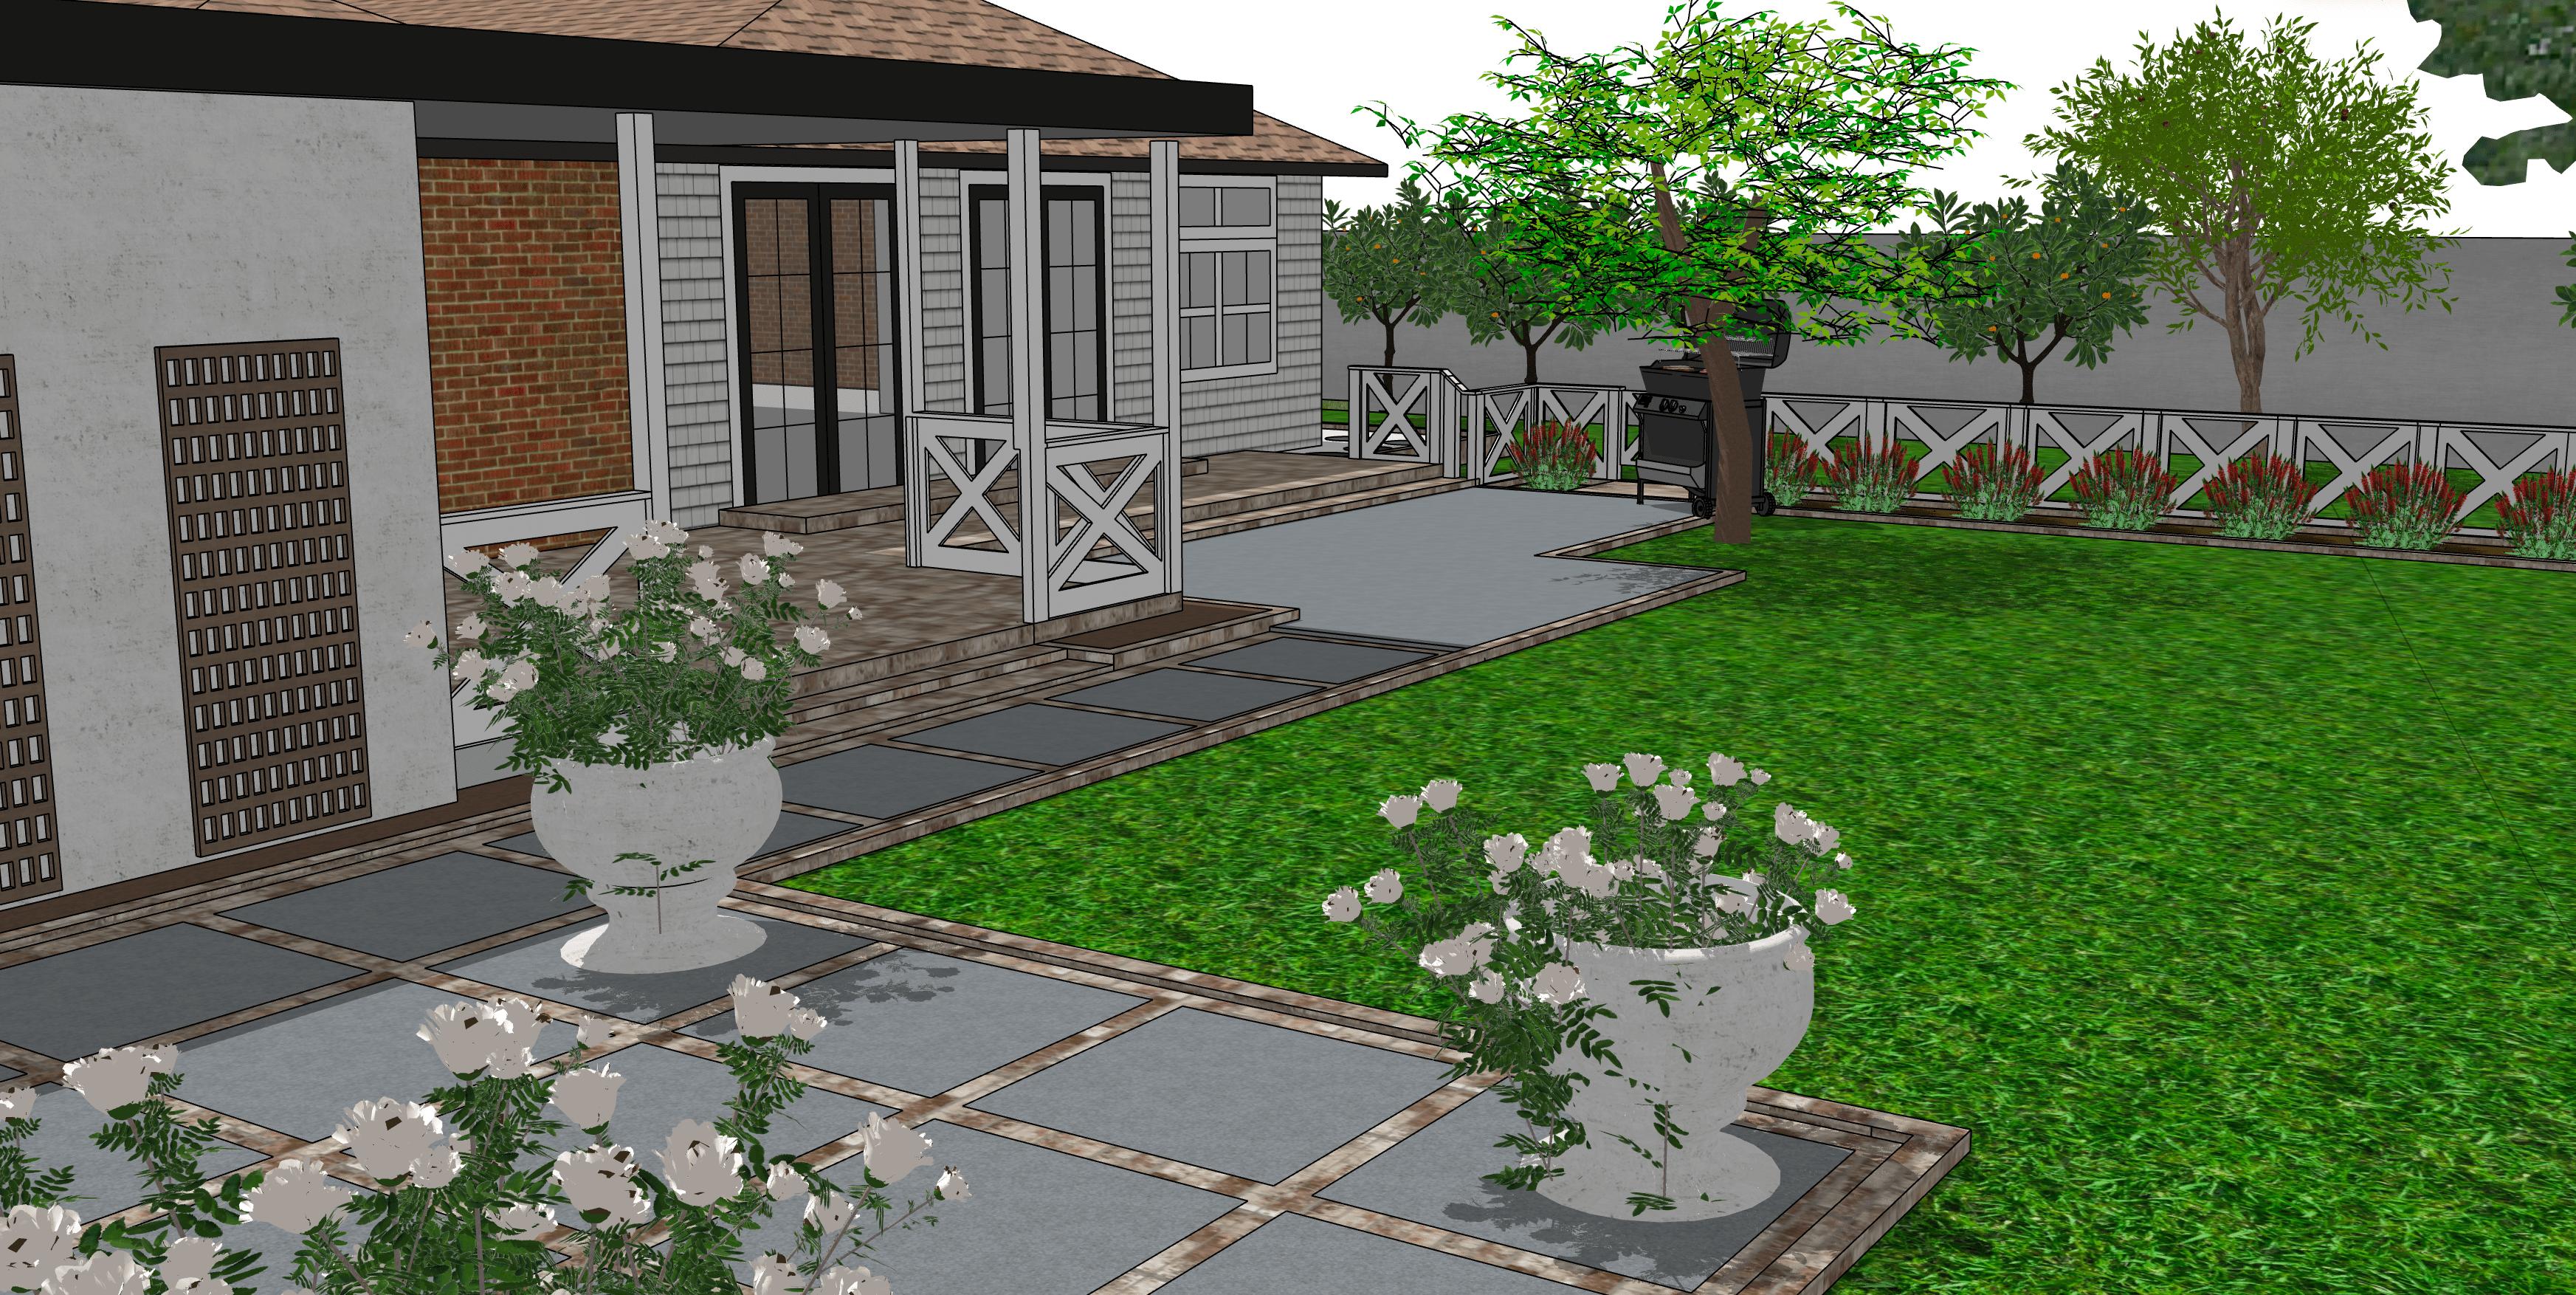 English garden black and white brick home landscape design ideas